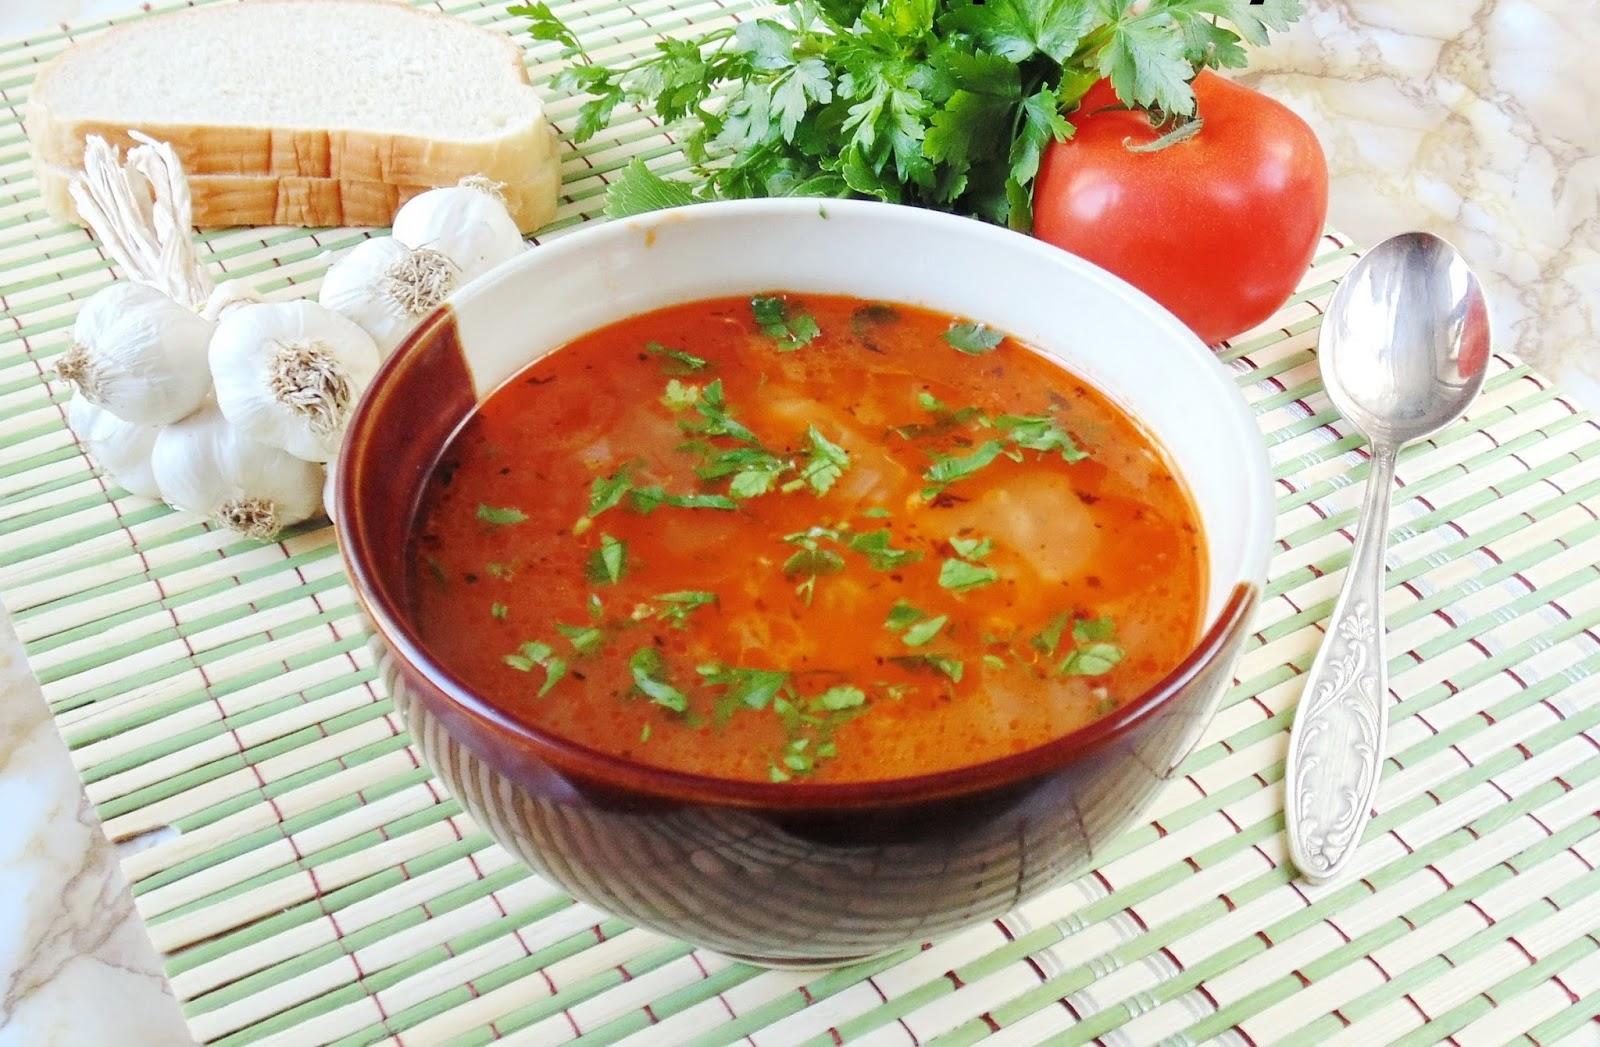 Рецепт супа харчо в домашних условиях с фото